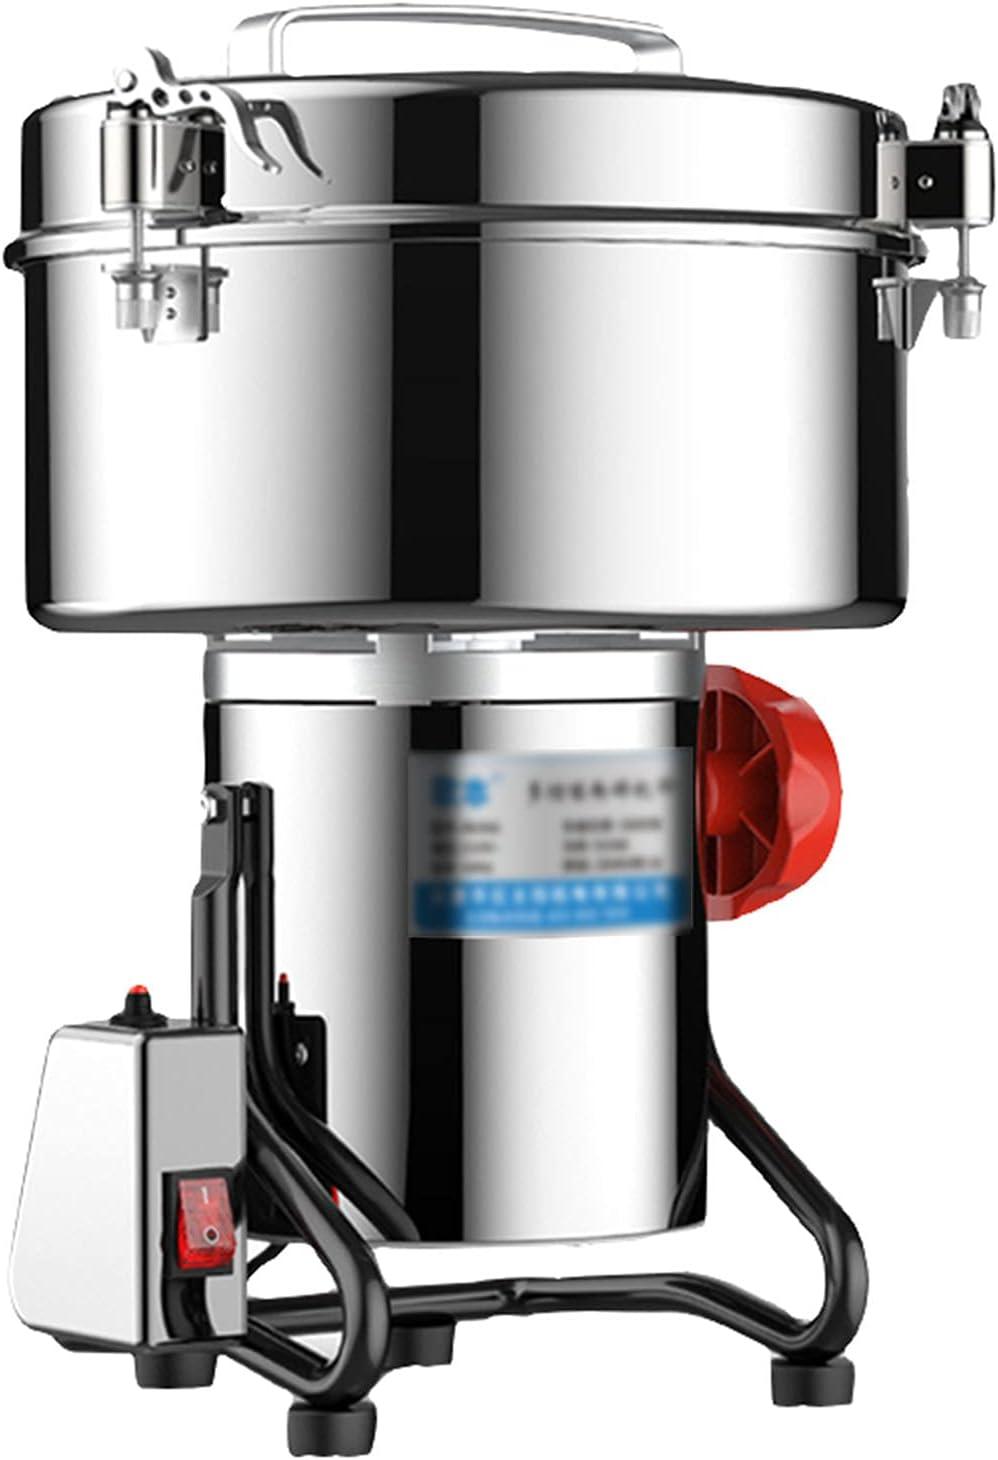 Grain Grinder 4500g large grinder 5000W Powder M unisex commercial Mill Very popular